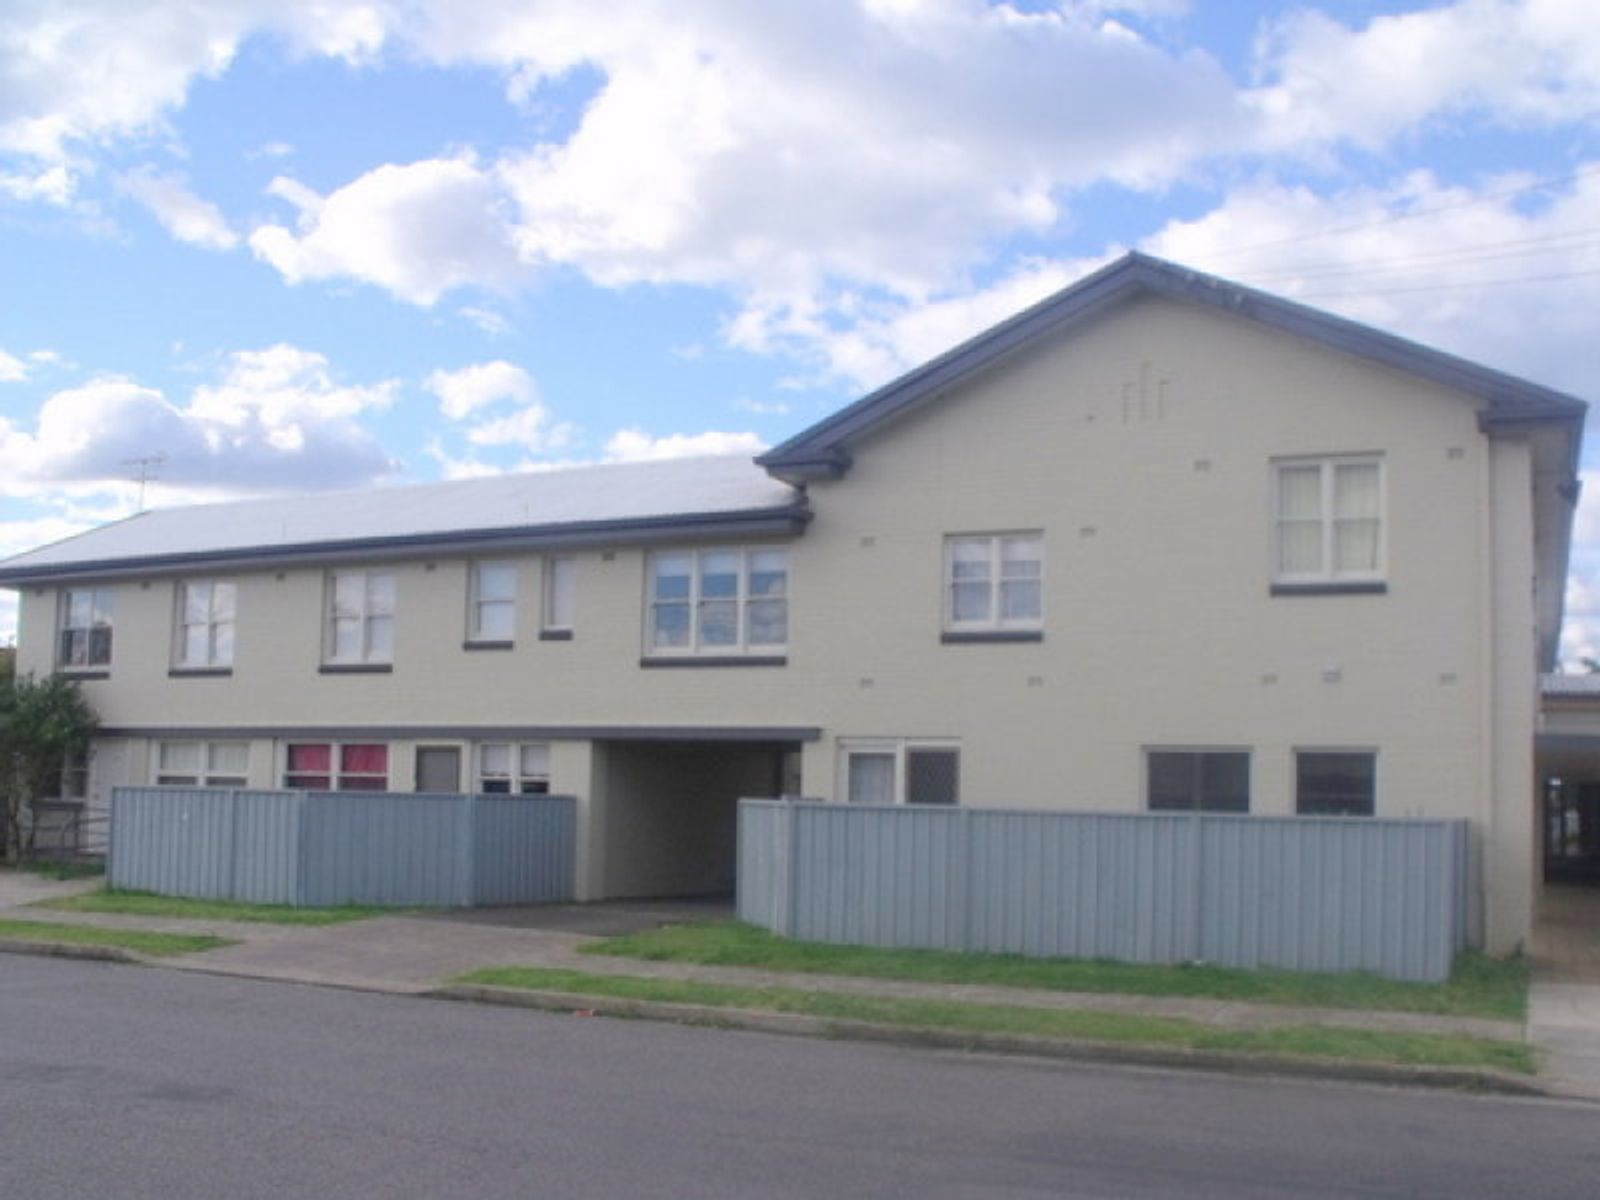 18/20 Pacific Highway, Blacksmiths, NSW 2281